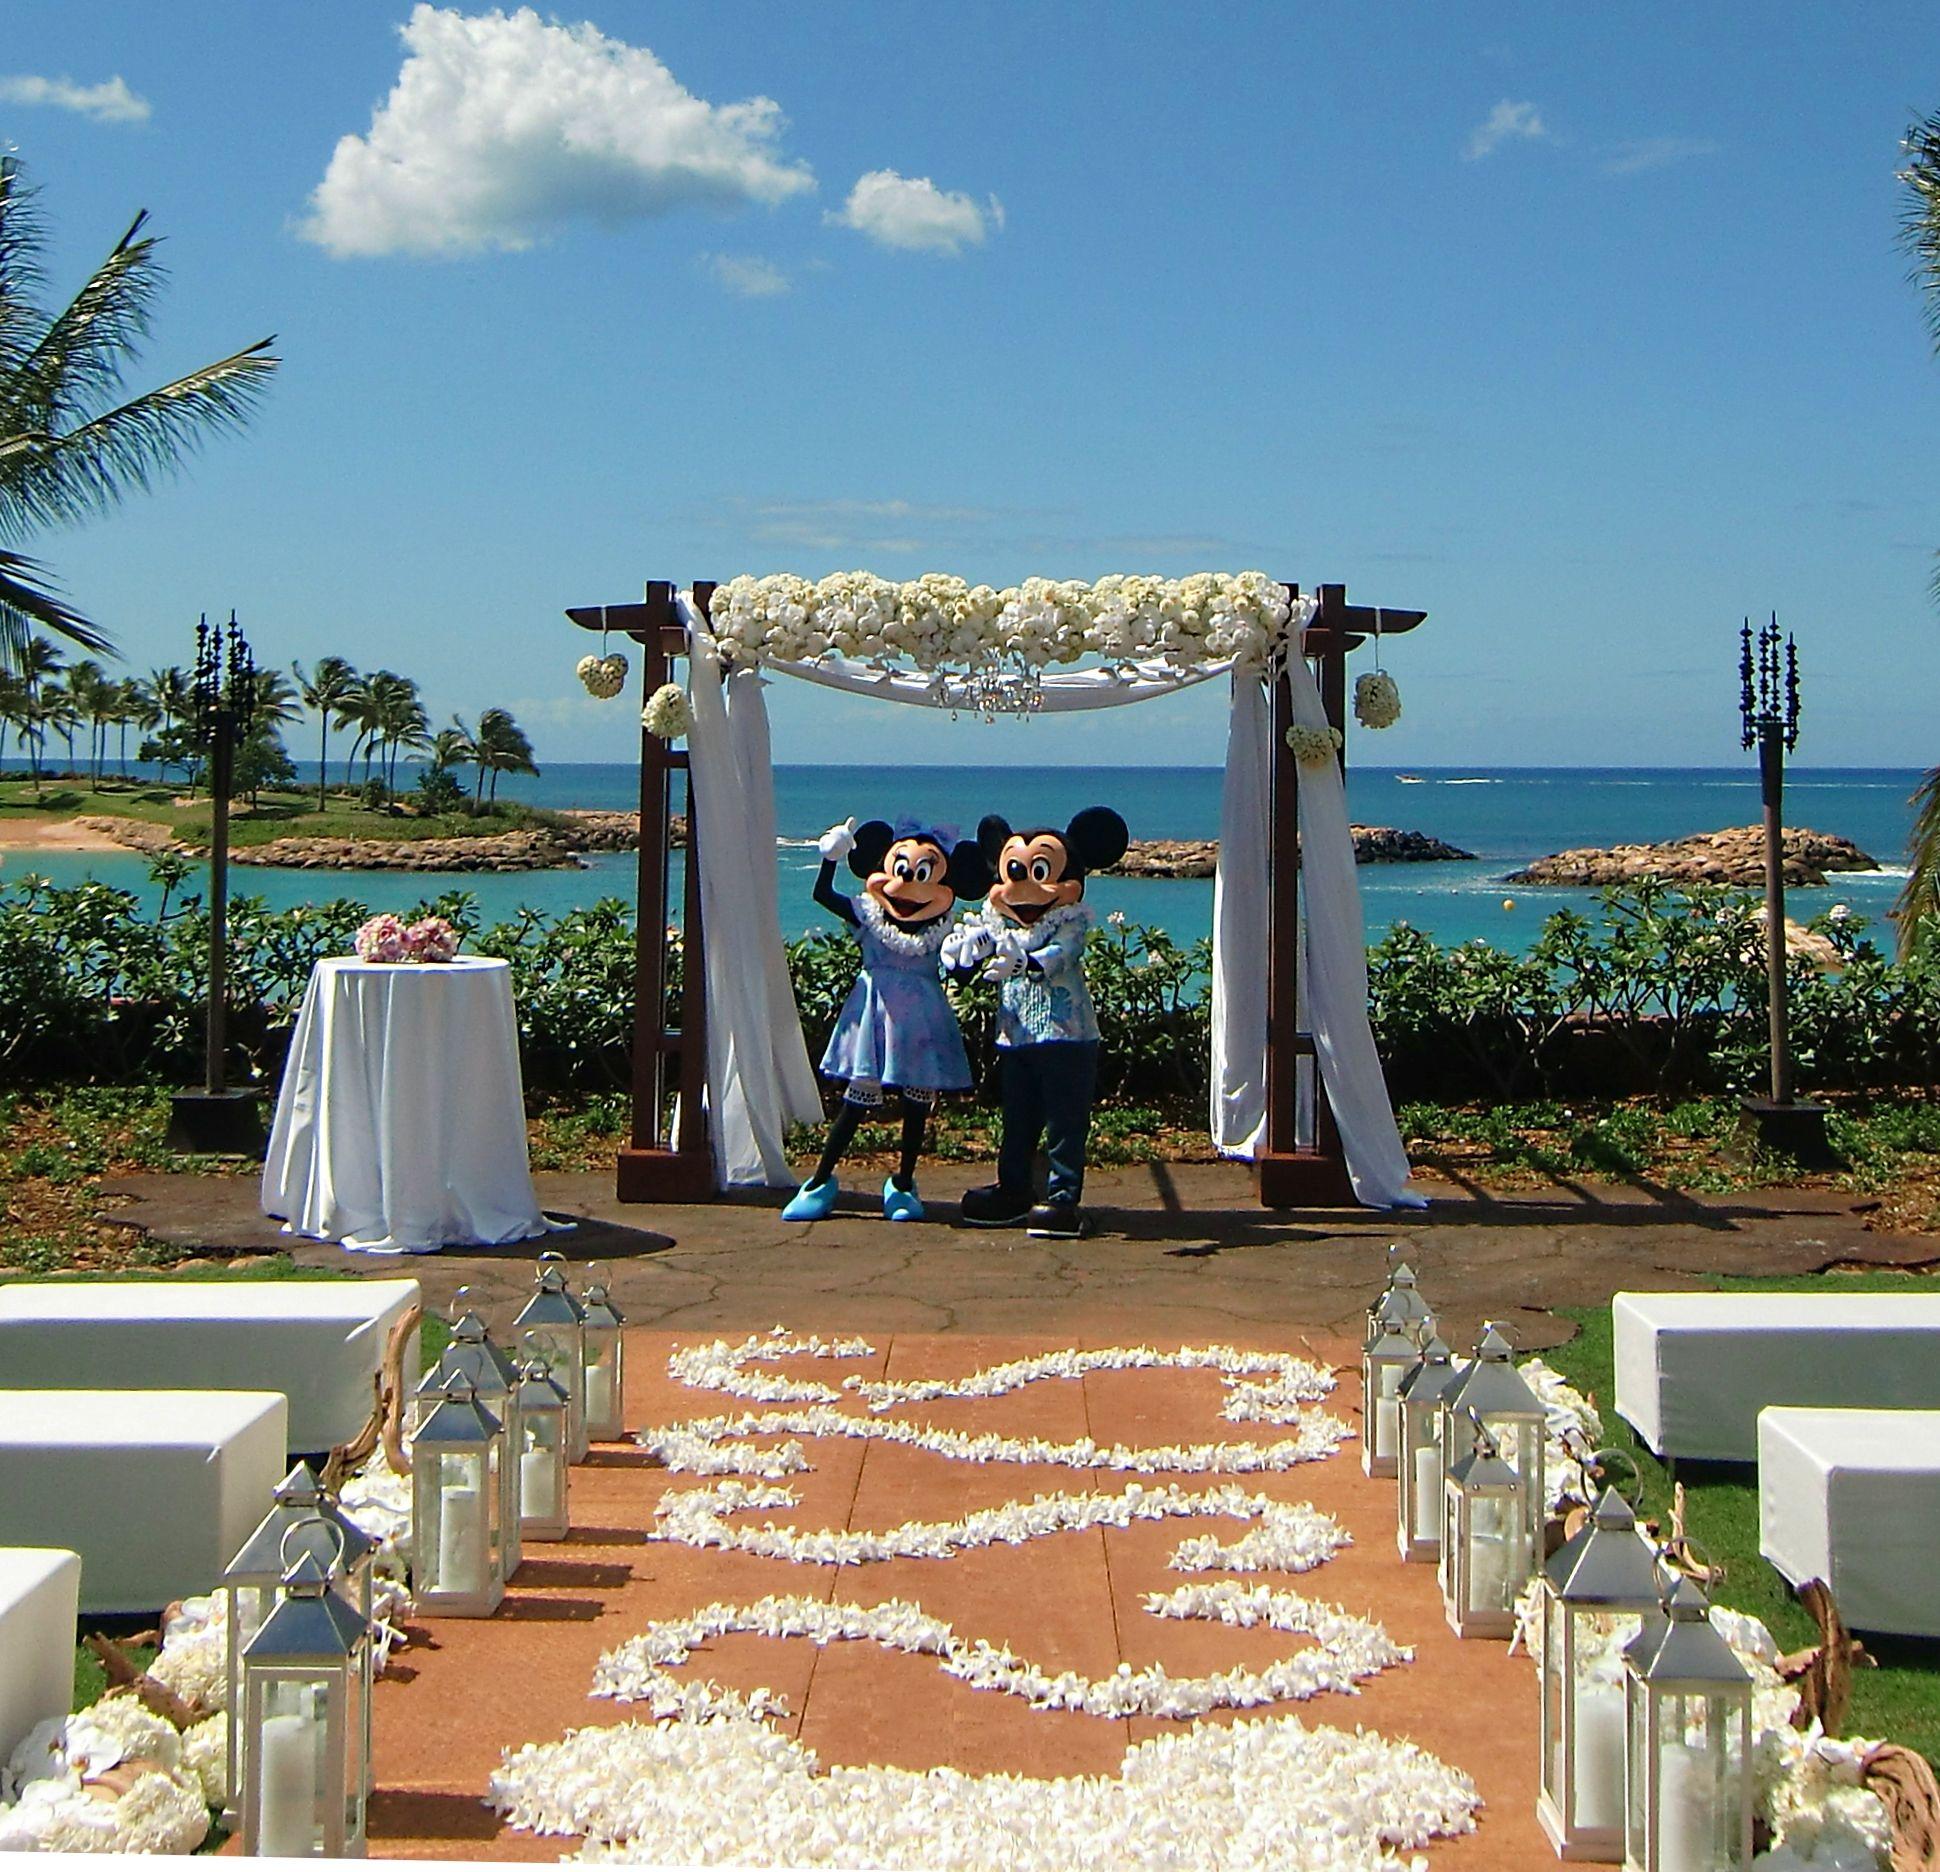 Pin By Tabitha Mendy On Hawaii Wedding Hawaii Destination Wedding Aulani Wedding Disney Inspired Wedding